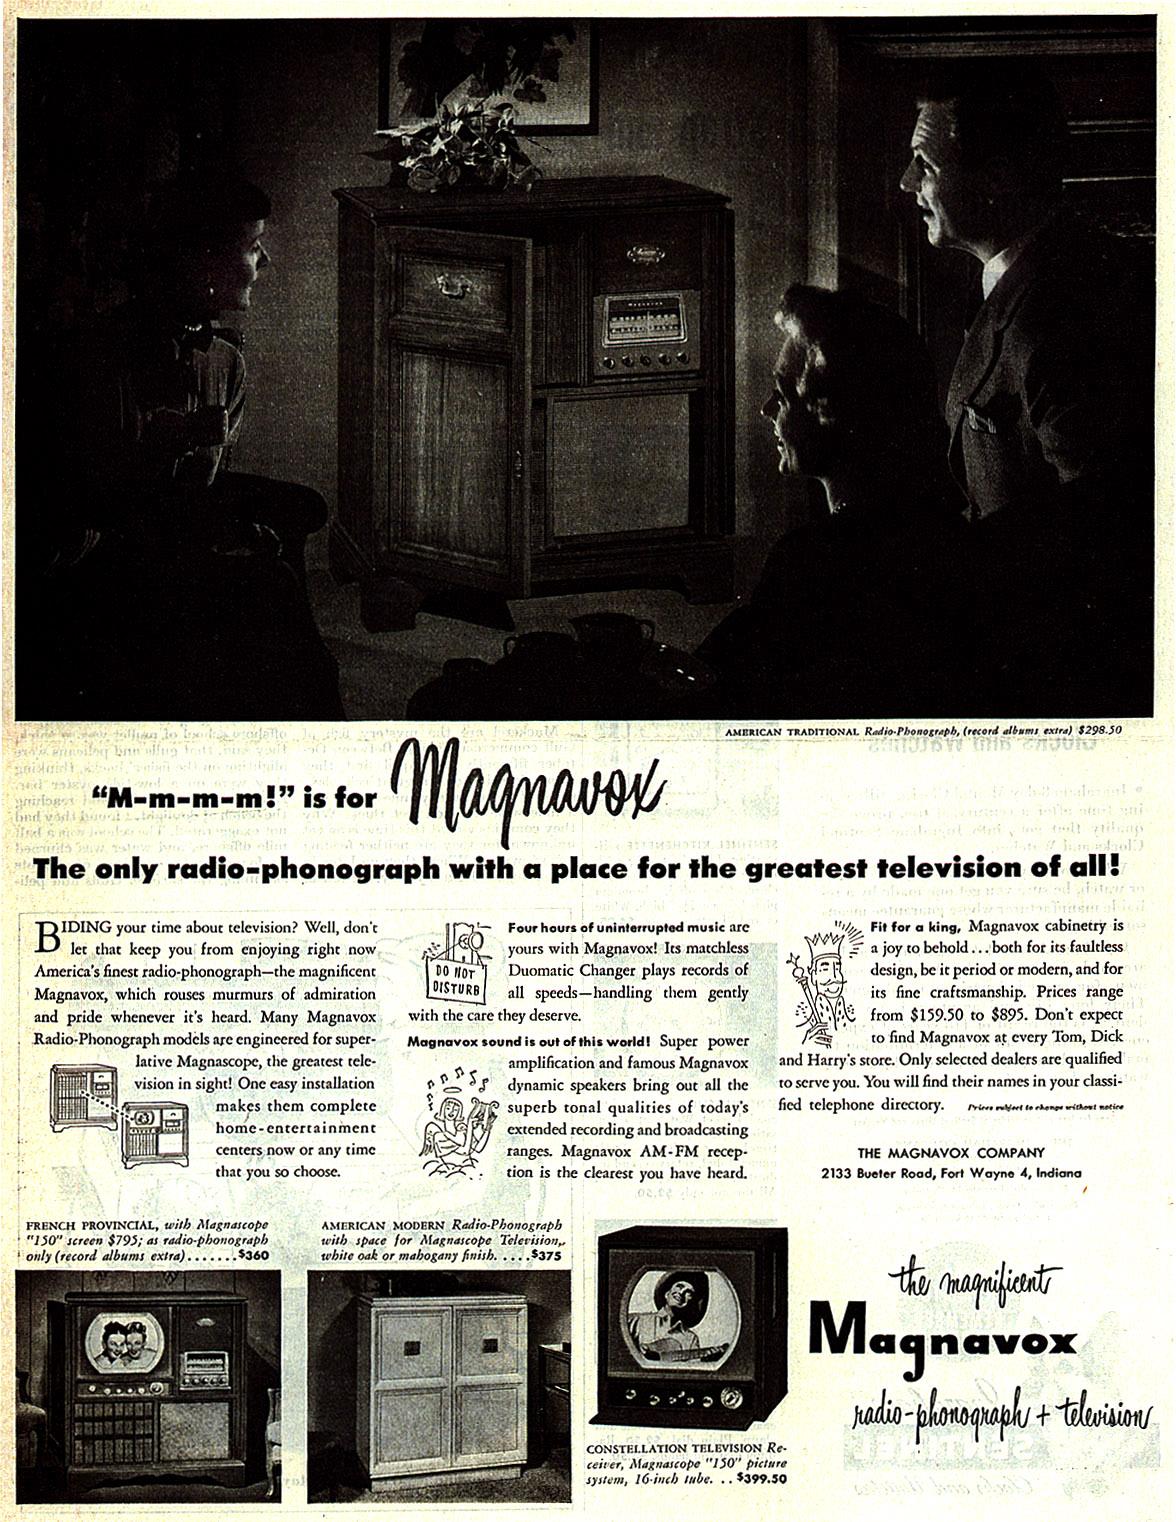 M-m-m-m_is_for_Magnavox